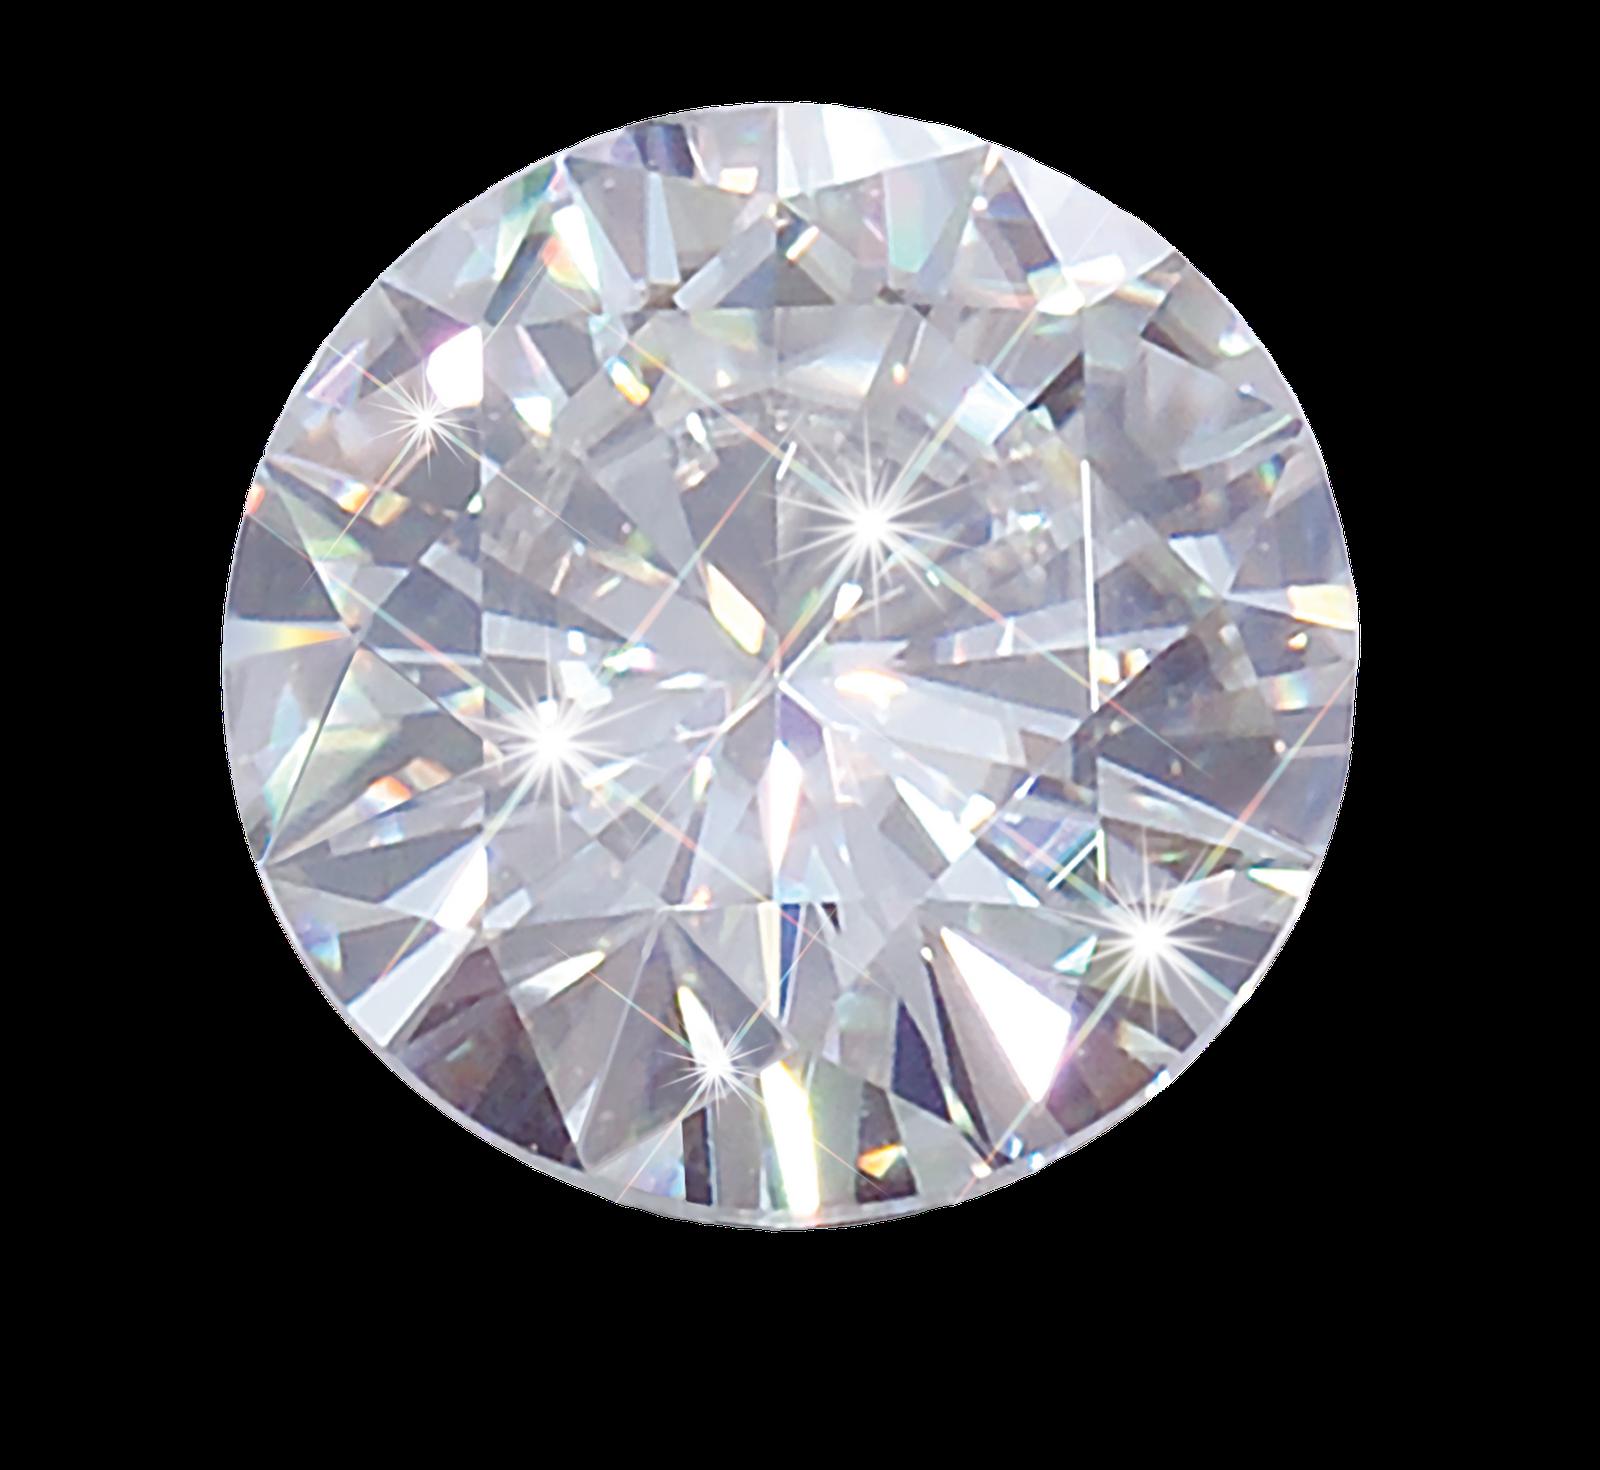 Png artwork pinterest art. Diamonds clipart small diamond